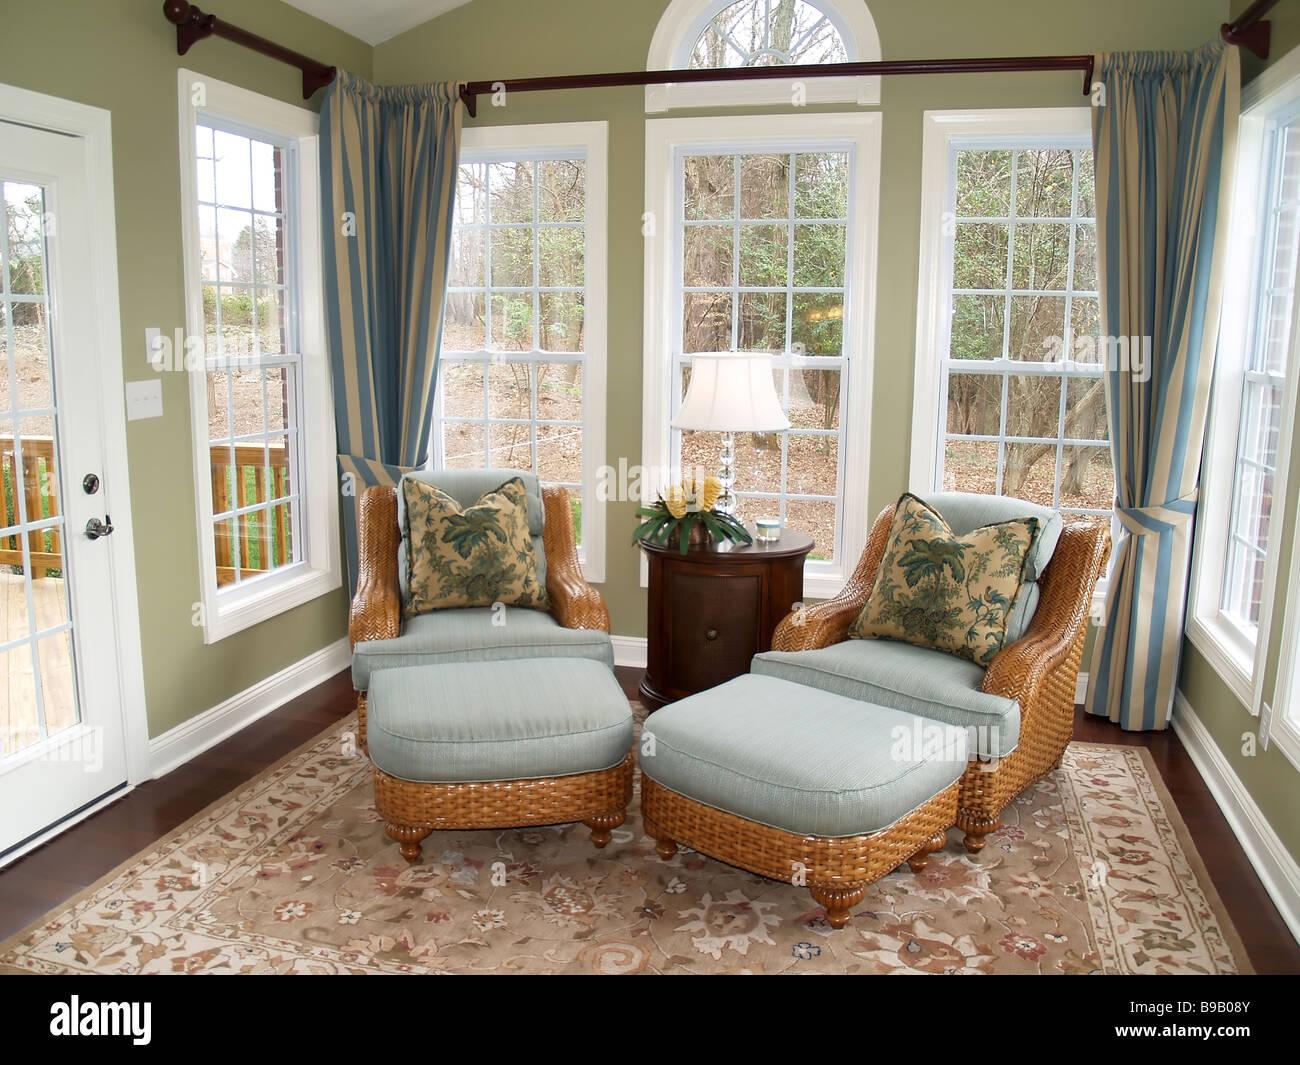 sunroom wicker furniture. Contemporary Sunroom Two Comfortable Rattan Or Wicker Chairs In A Nicely Decorated Luxury Sunroom In Sunroom Wicker Furniture